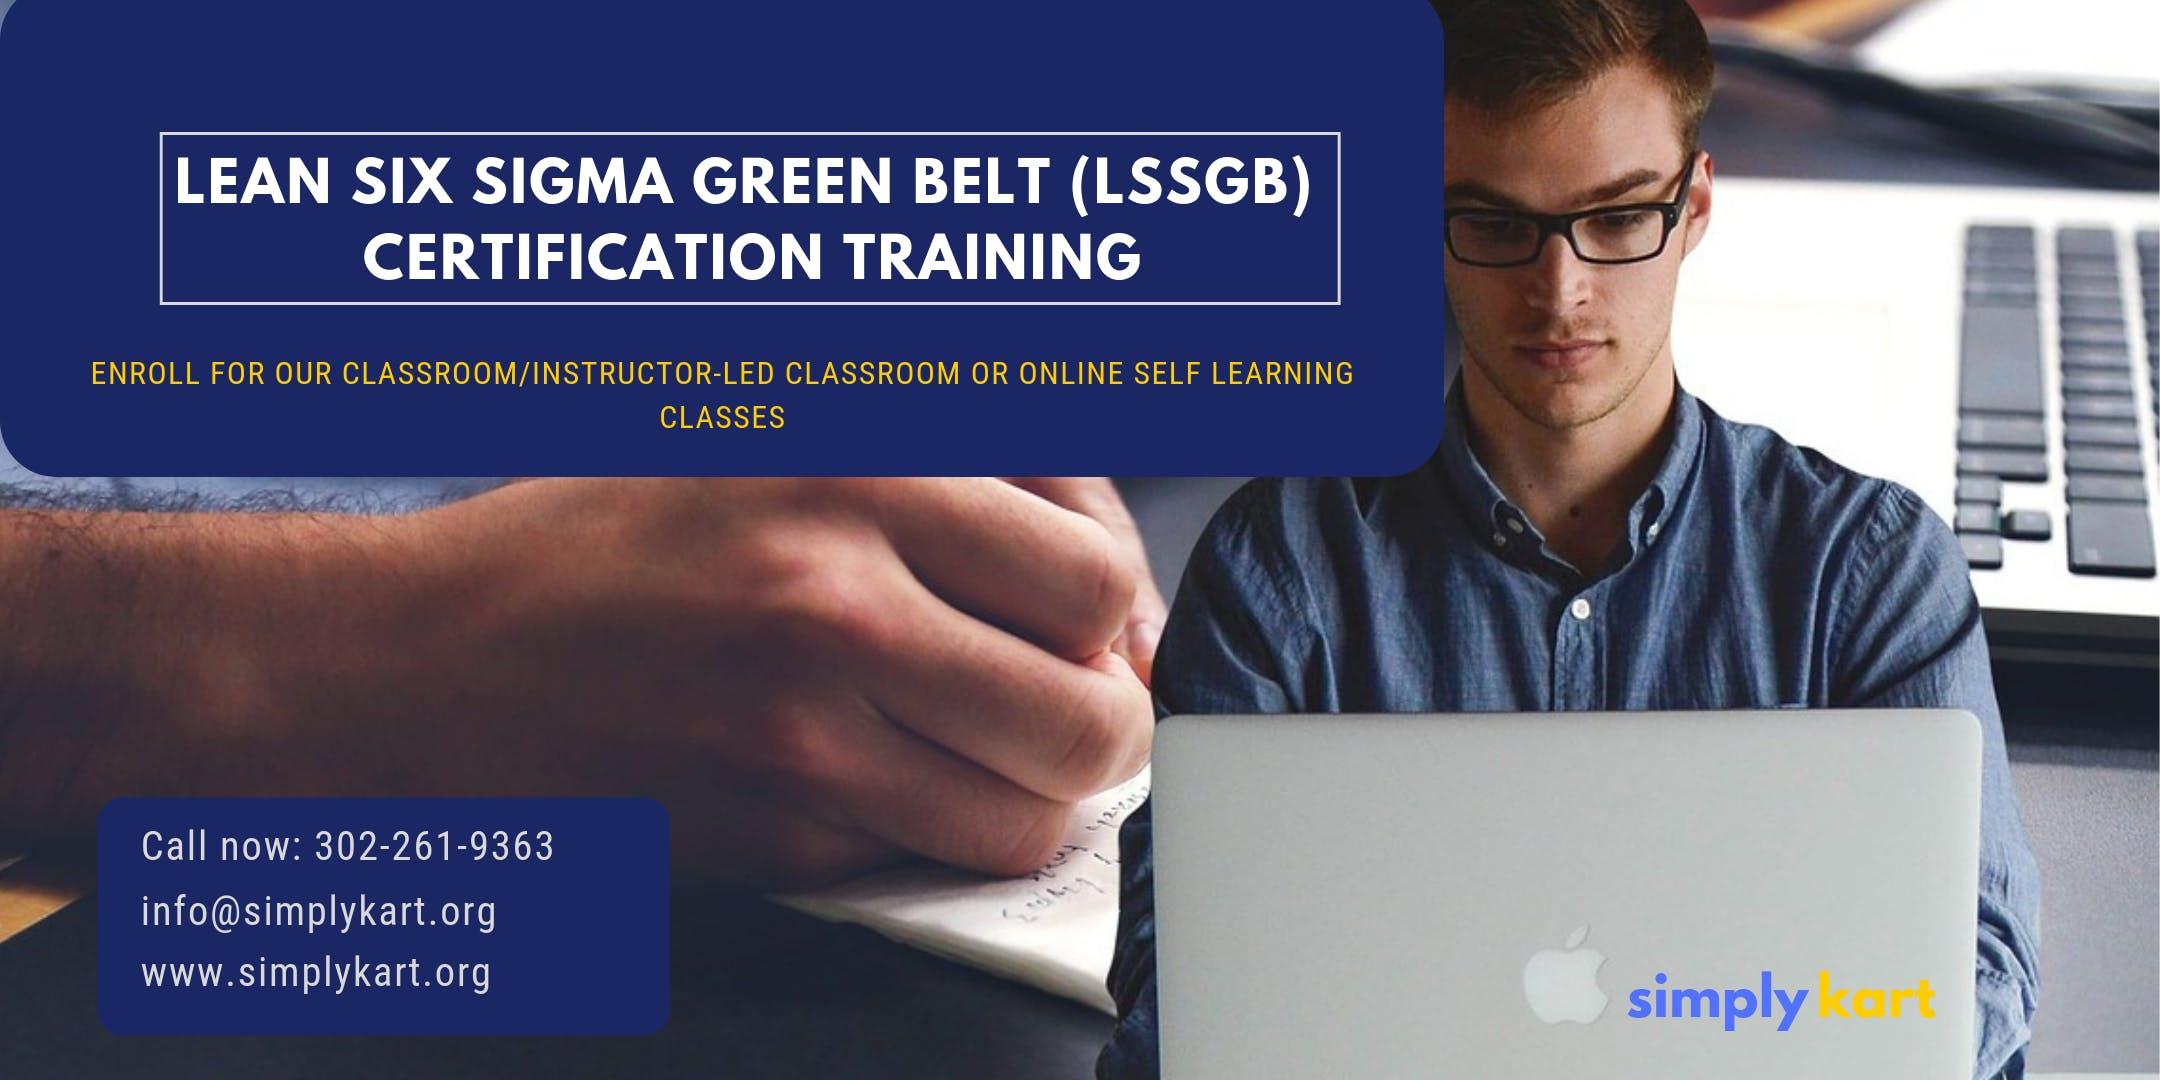 Lean Six Sigma Green Belt (LSSGB) Certification Training in Brampton, ON